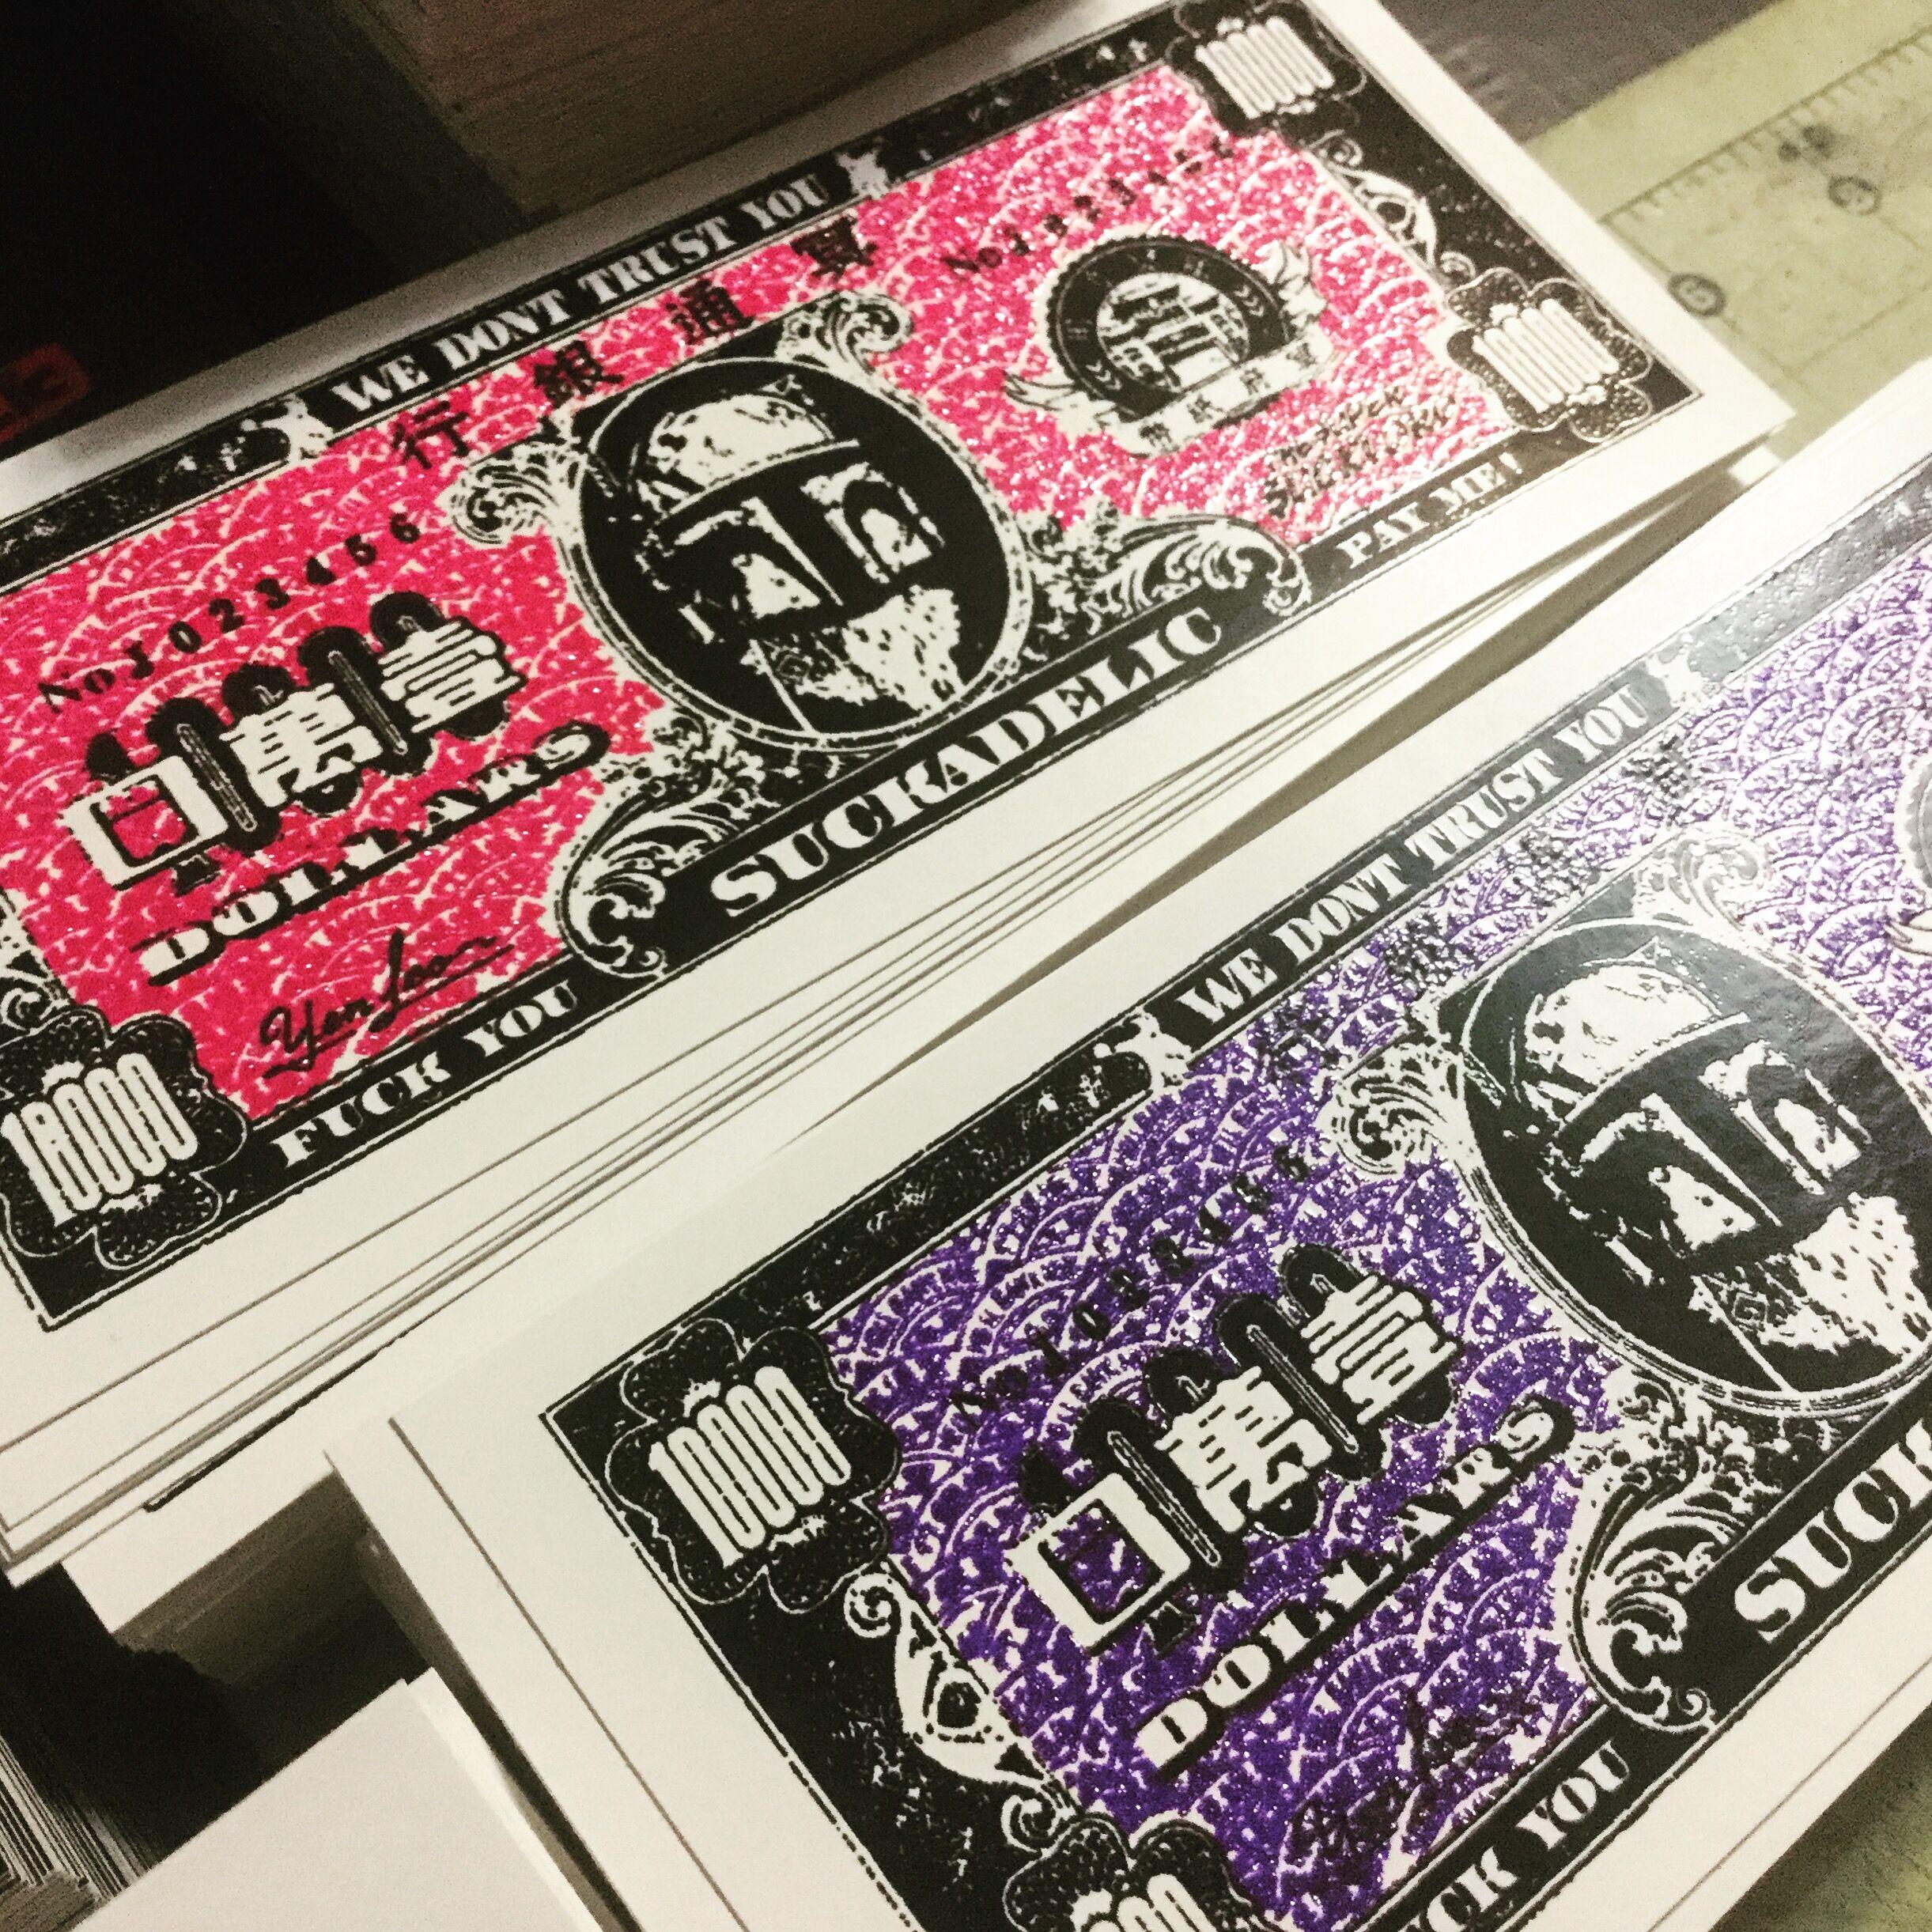 Discordia Culture Shop SUCKADELIC Stoopid Stickers Series 01 STOOPIDSTICKER-PINKGLITTER-FULLSET